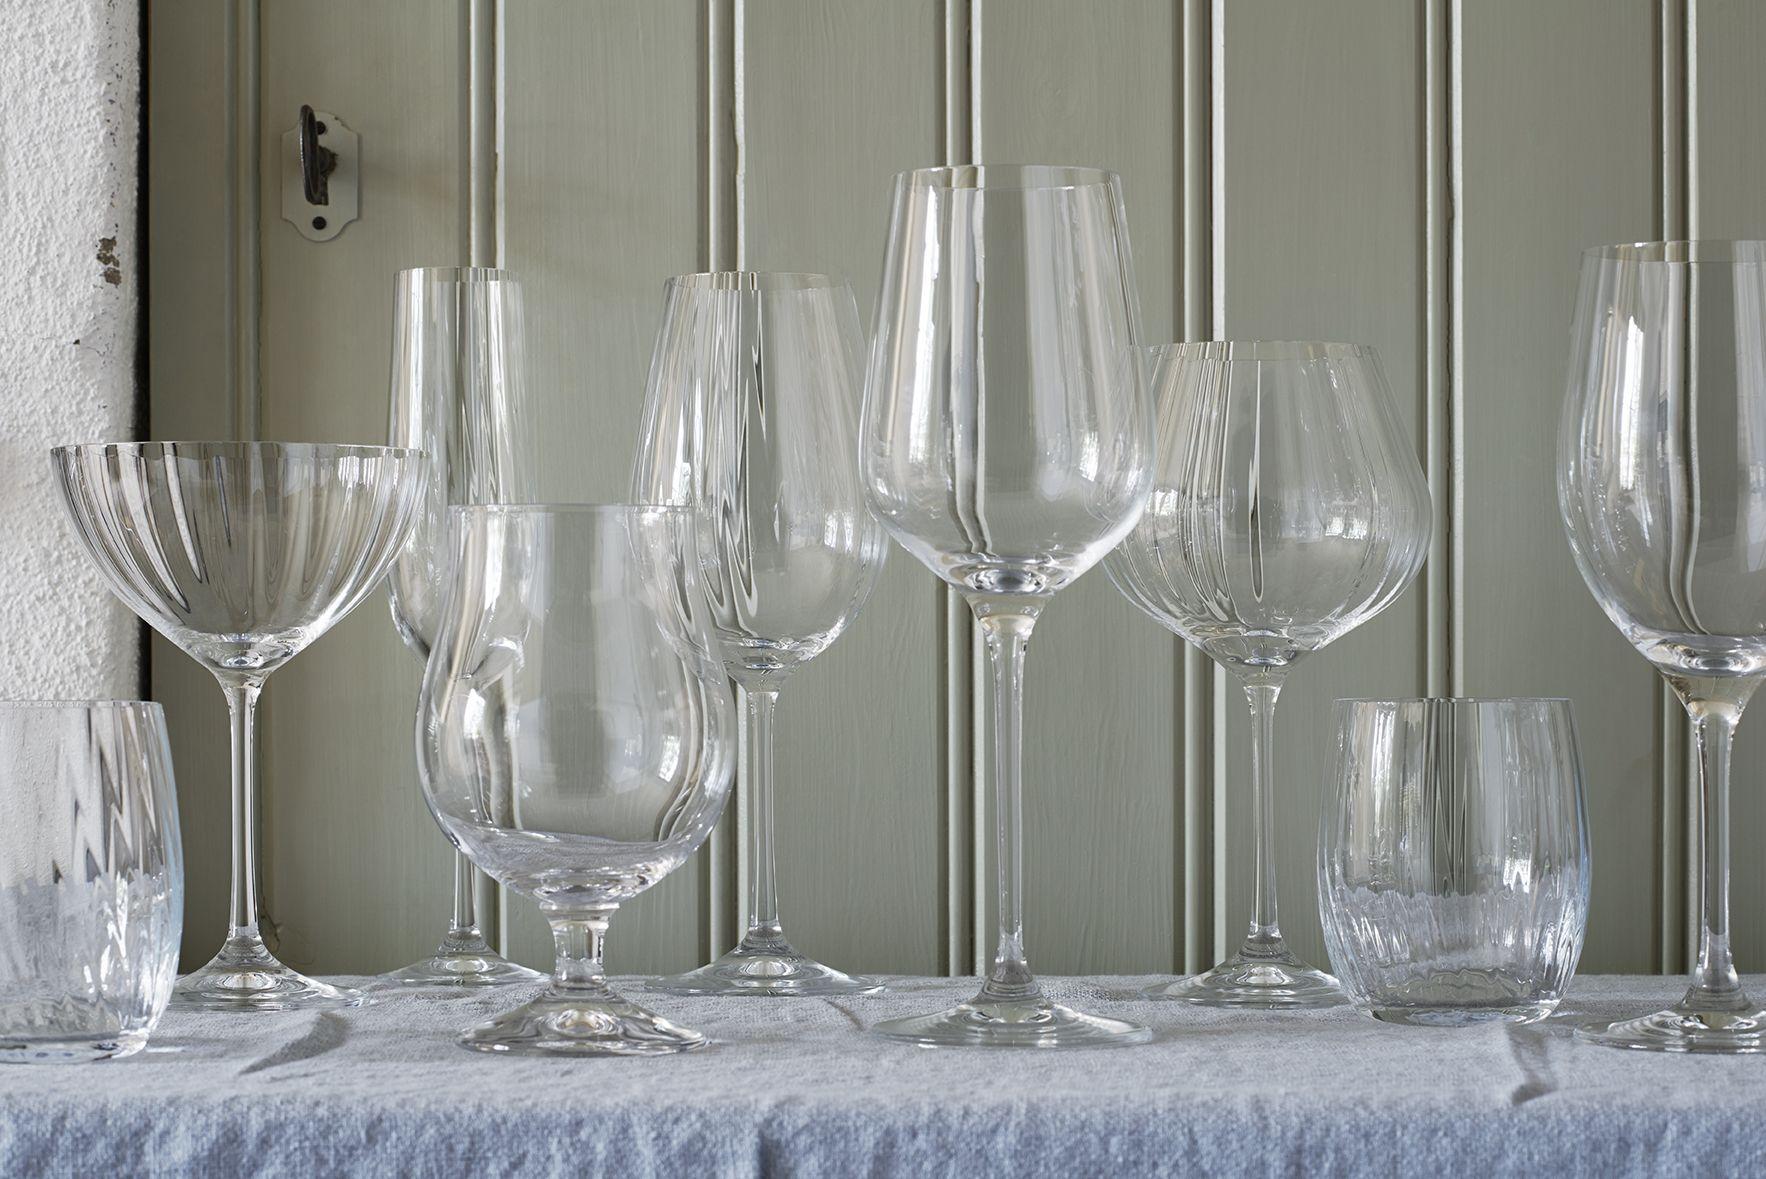 Glas från Table Top Stories - Celebration, Rumours, Secret